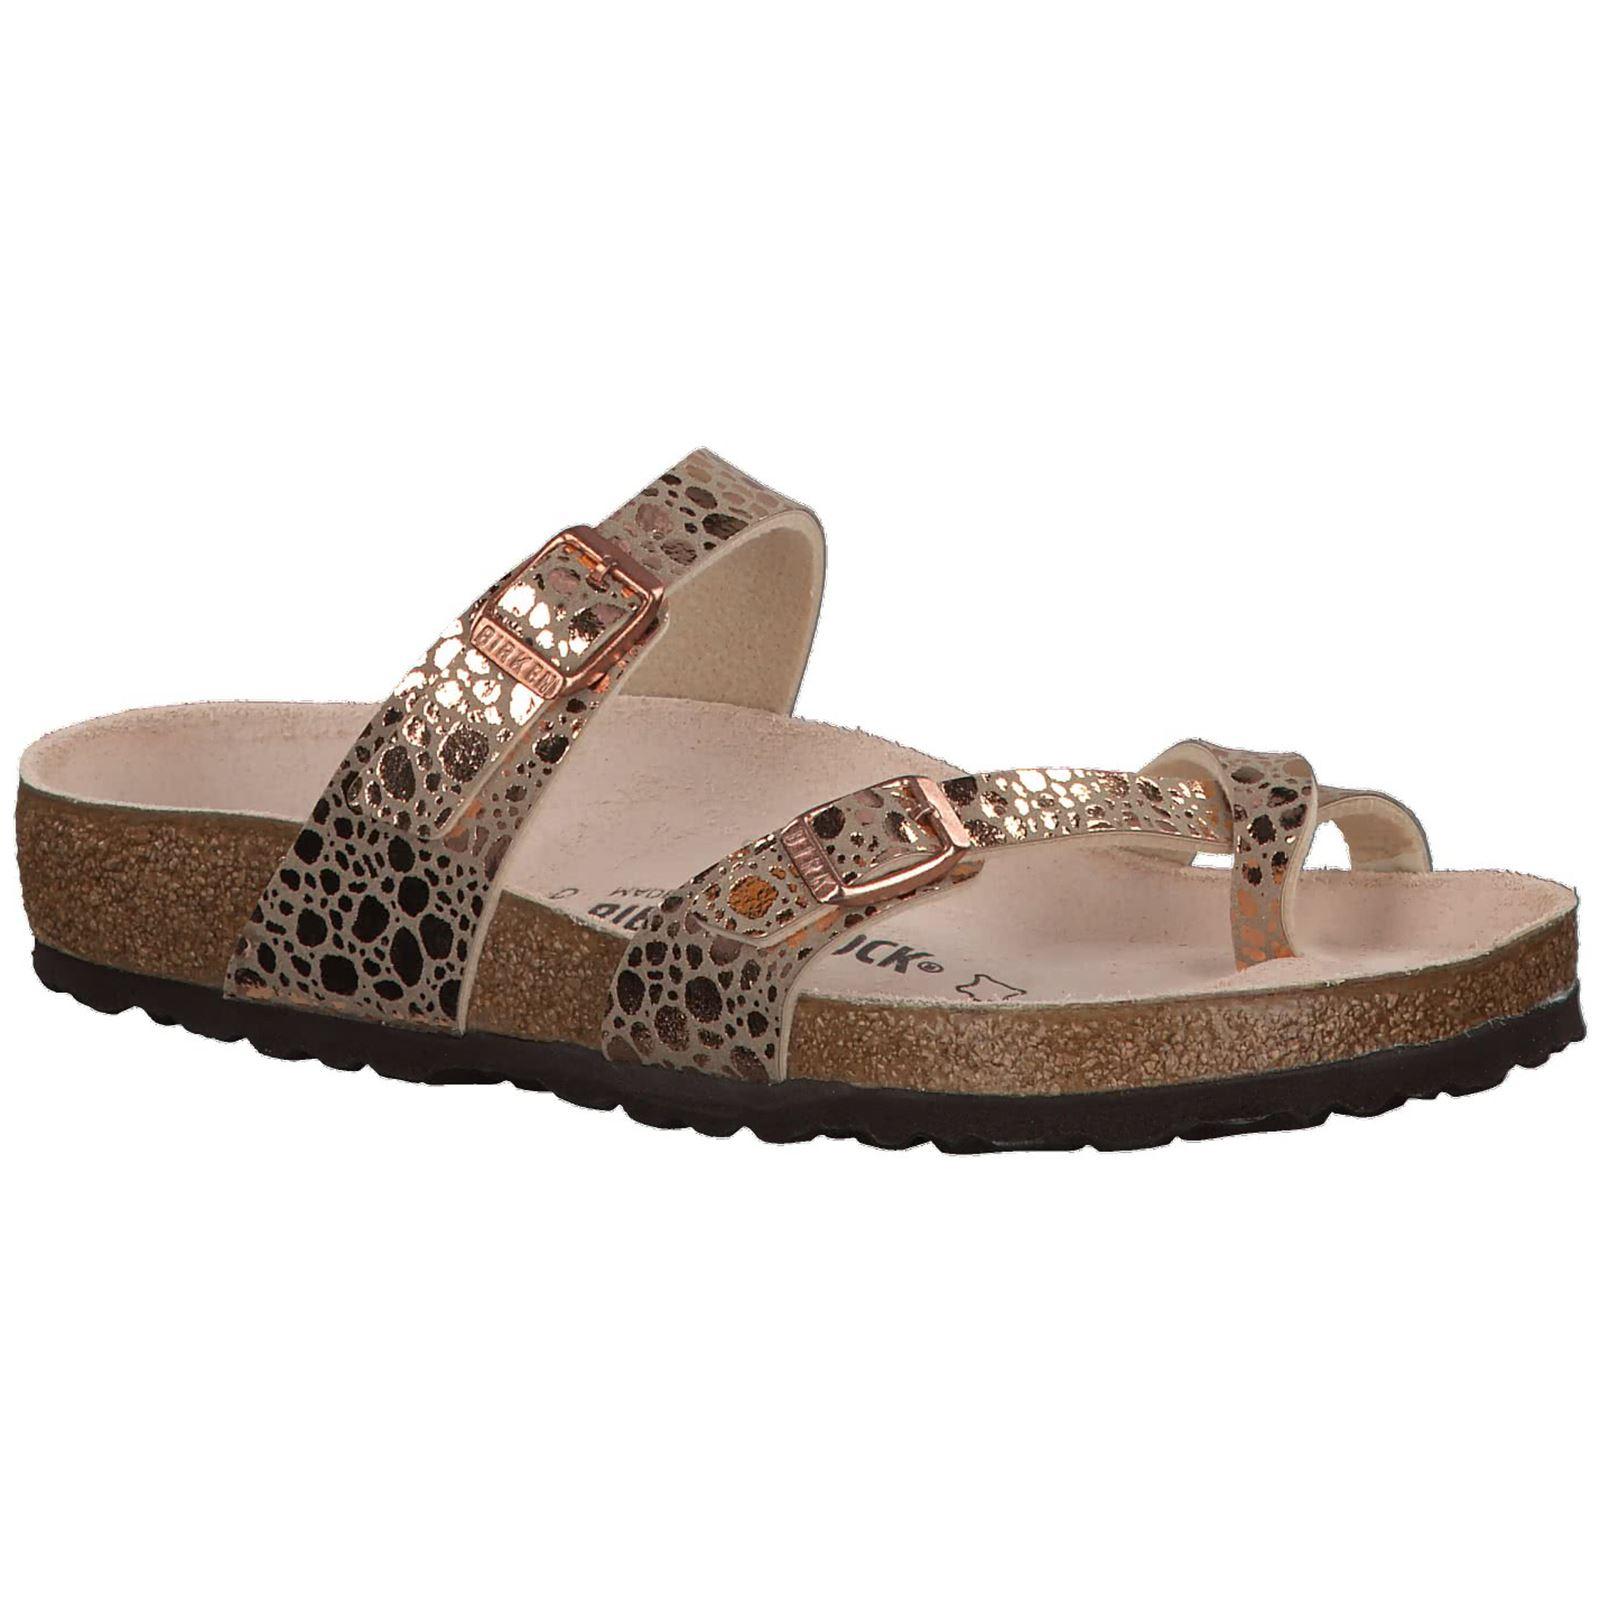 e502329297d Birkenstock Mayari Metallic Stones Copper Womens Birko-Flor Open-Back  Sandals